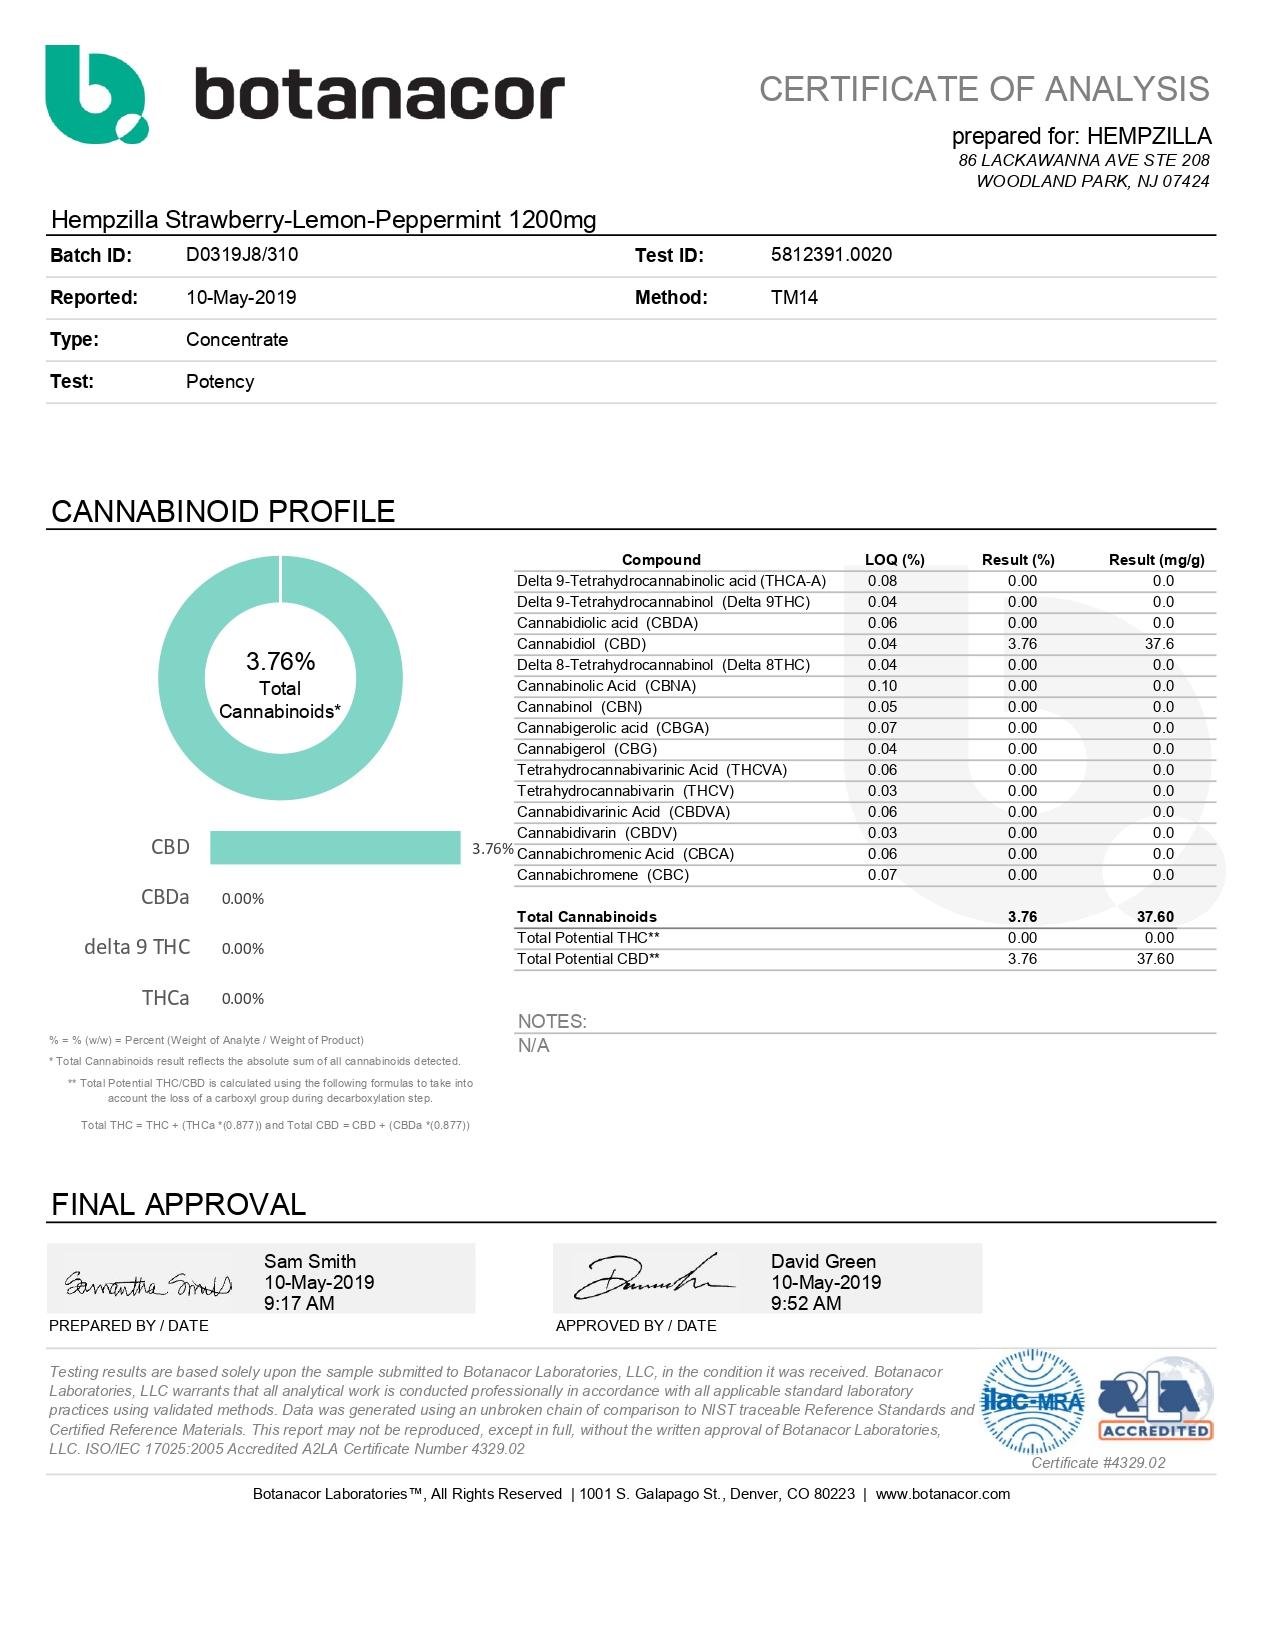 Hempzilla CBD Tincture Lemon Berry Mint 1200mg Lab Report